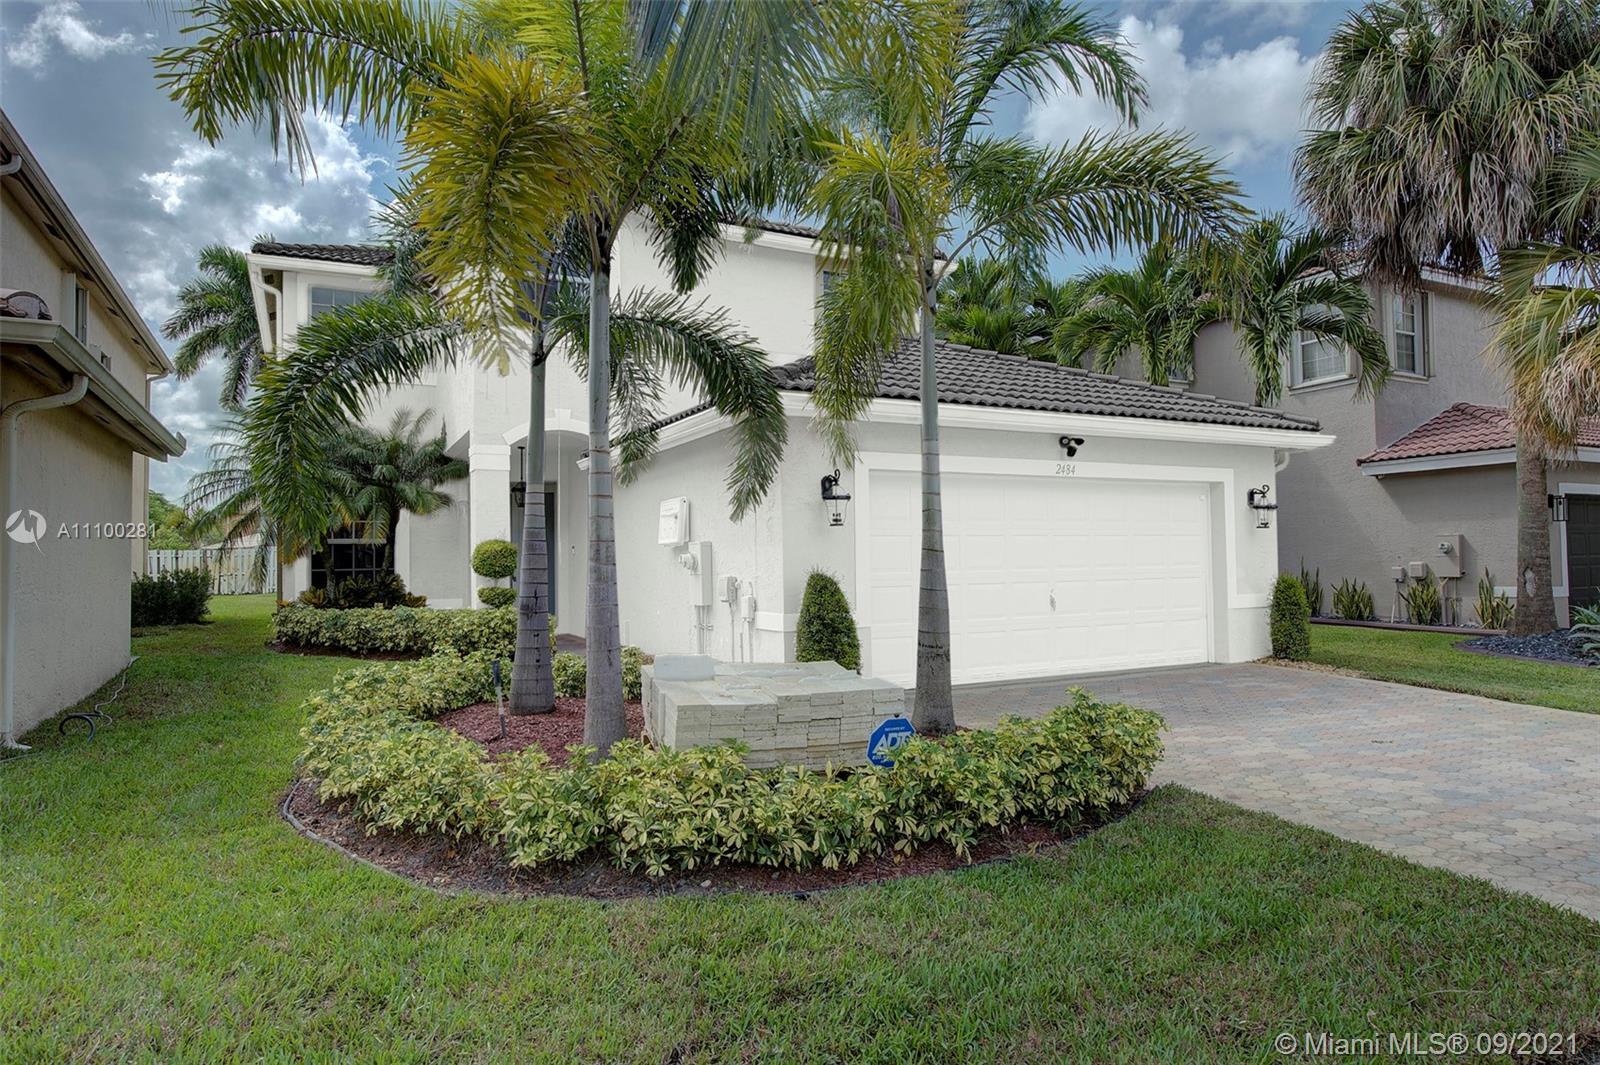 Silver Shores - 2484 SW 162nd Ave, Miramar, FL 33027